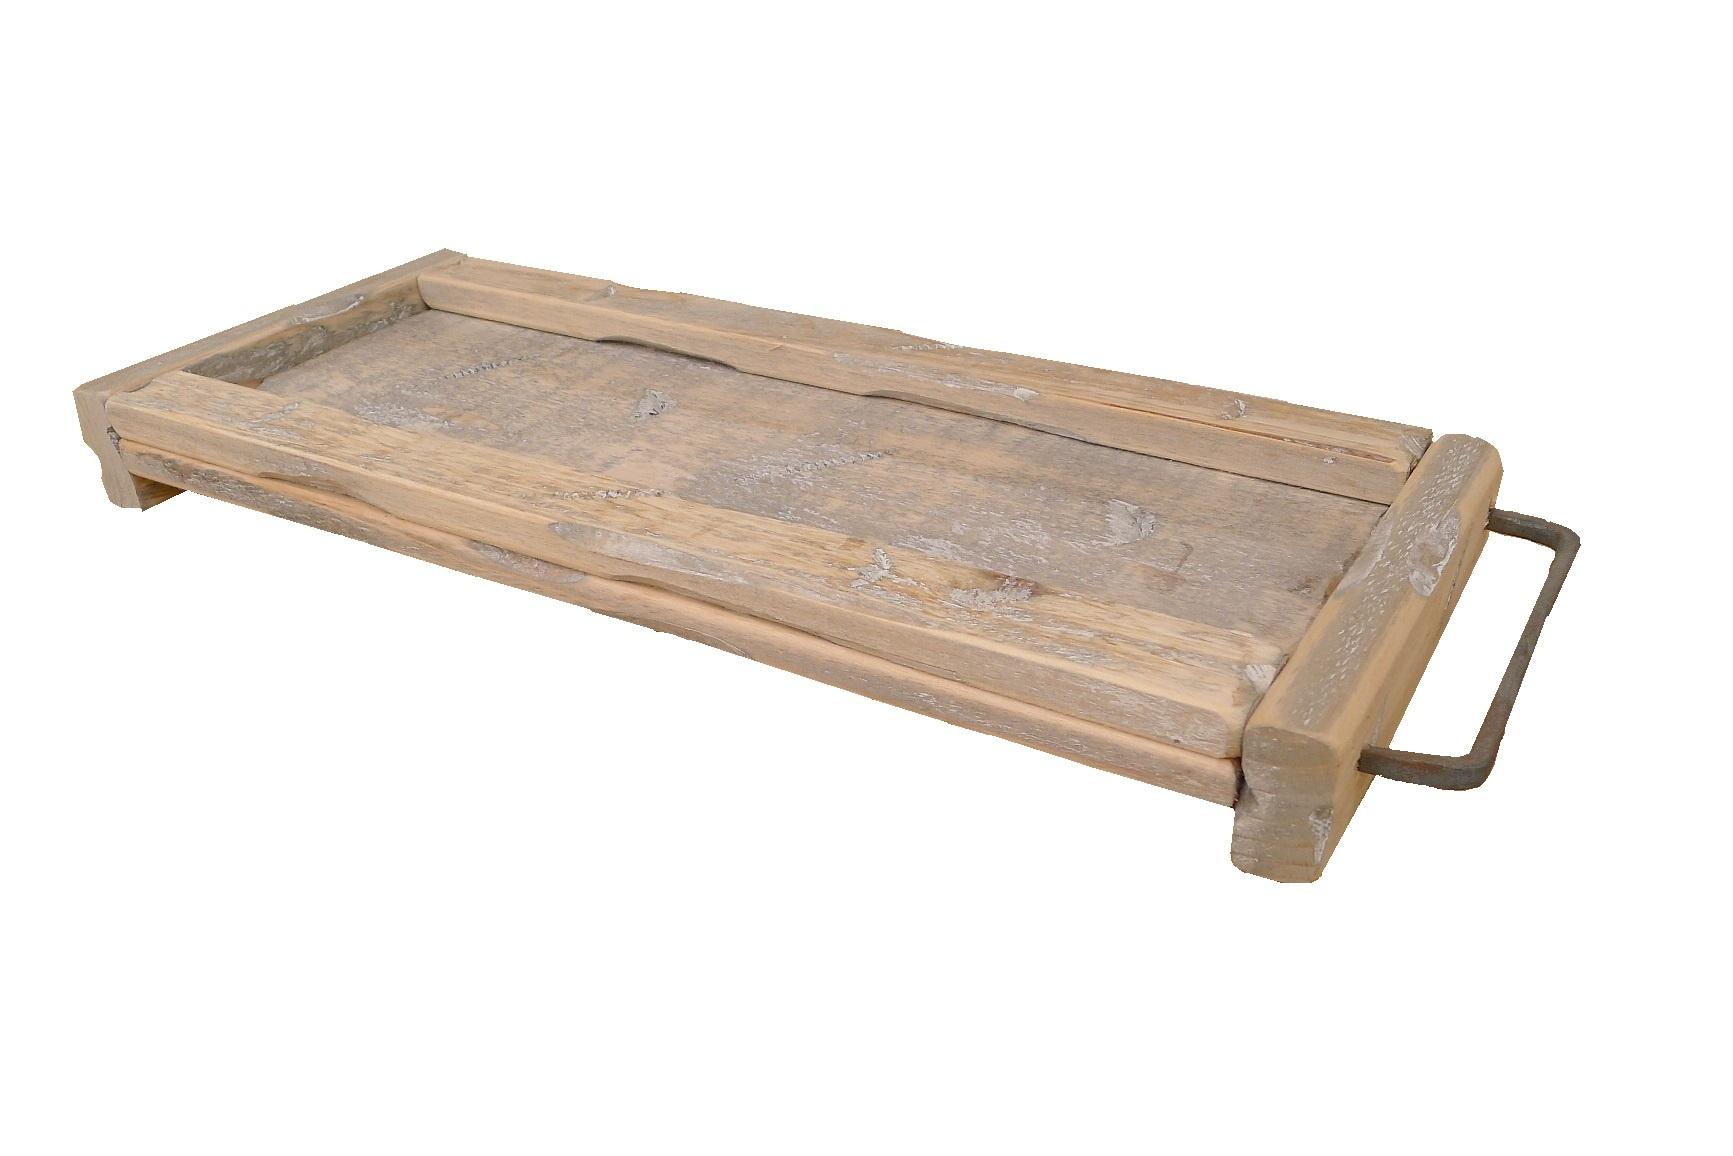 tray old dutchempress 40-1